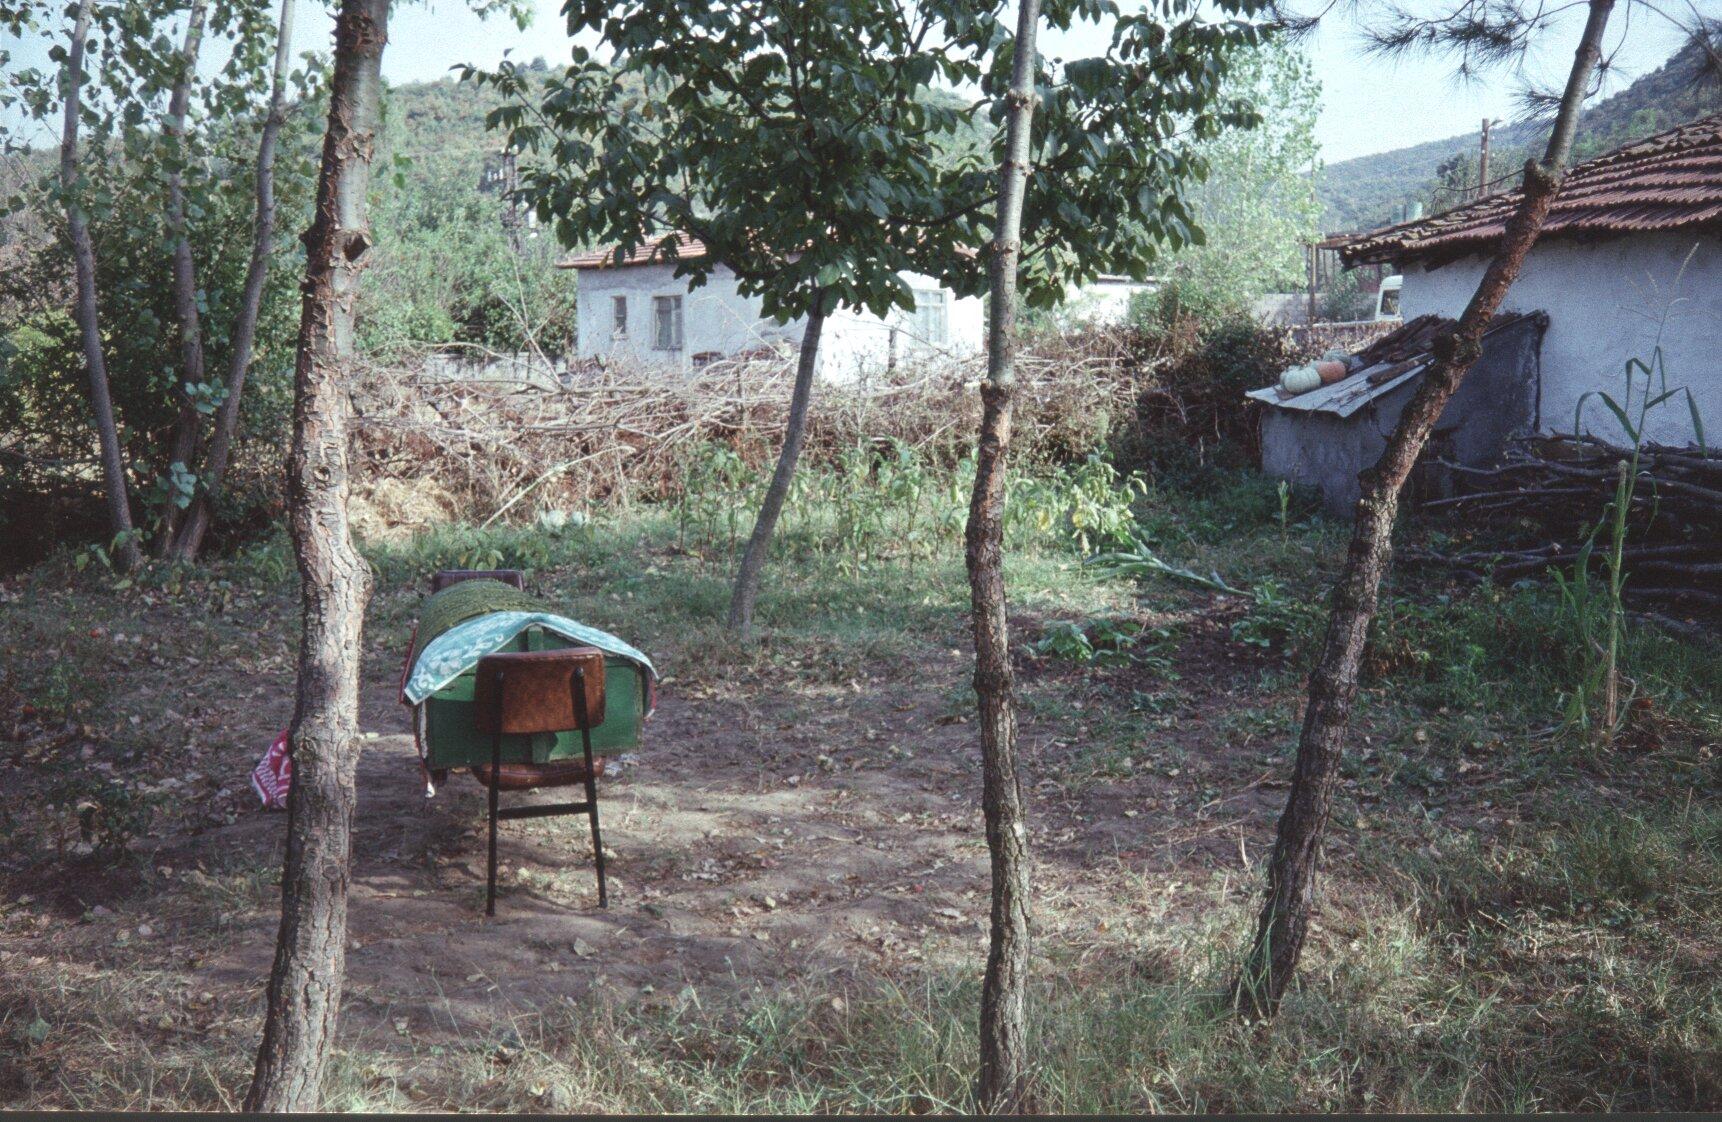 011 kist op stoel